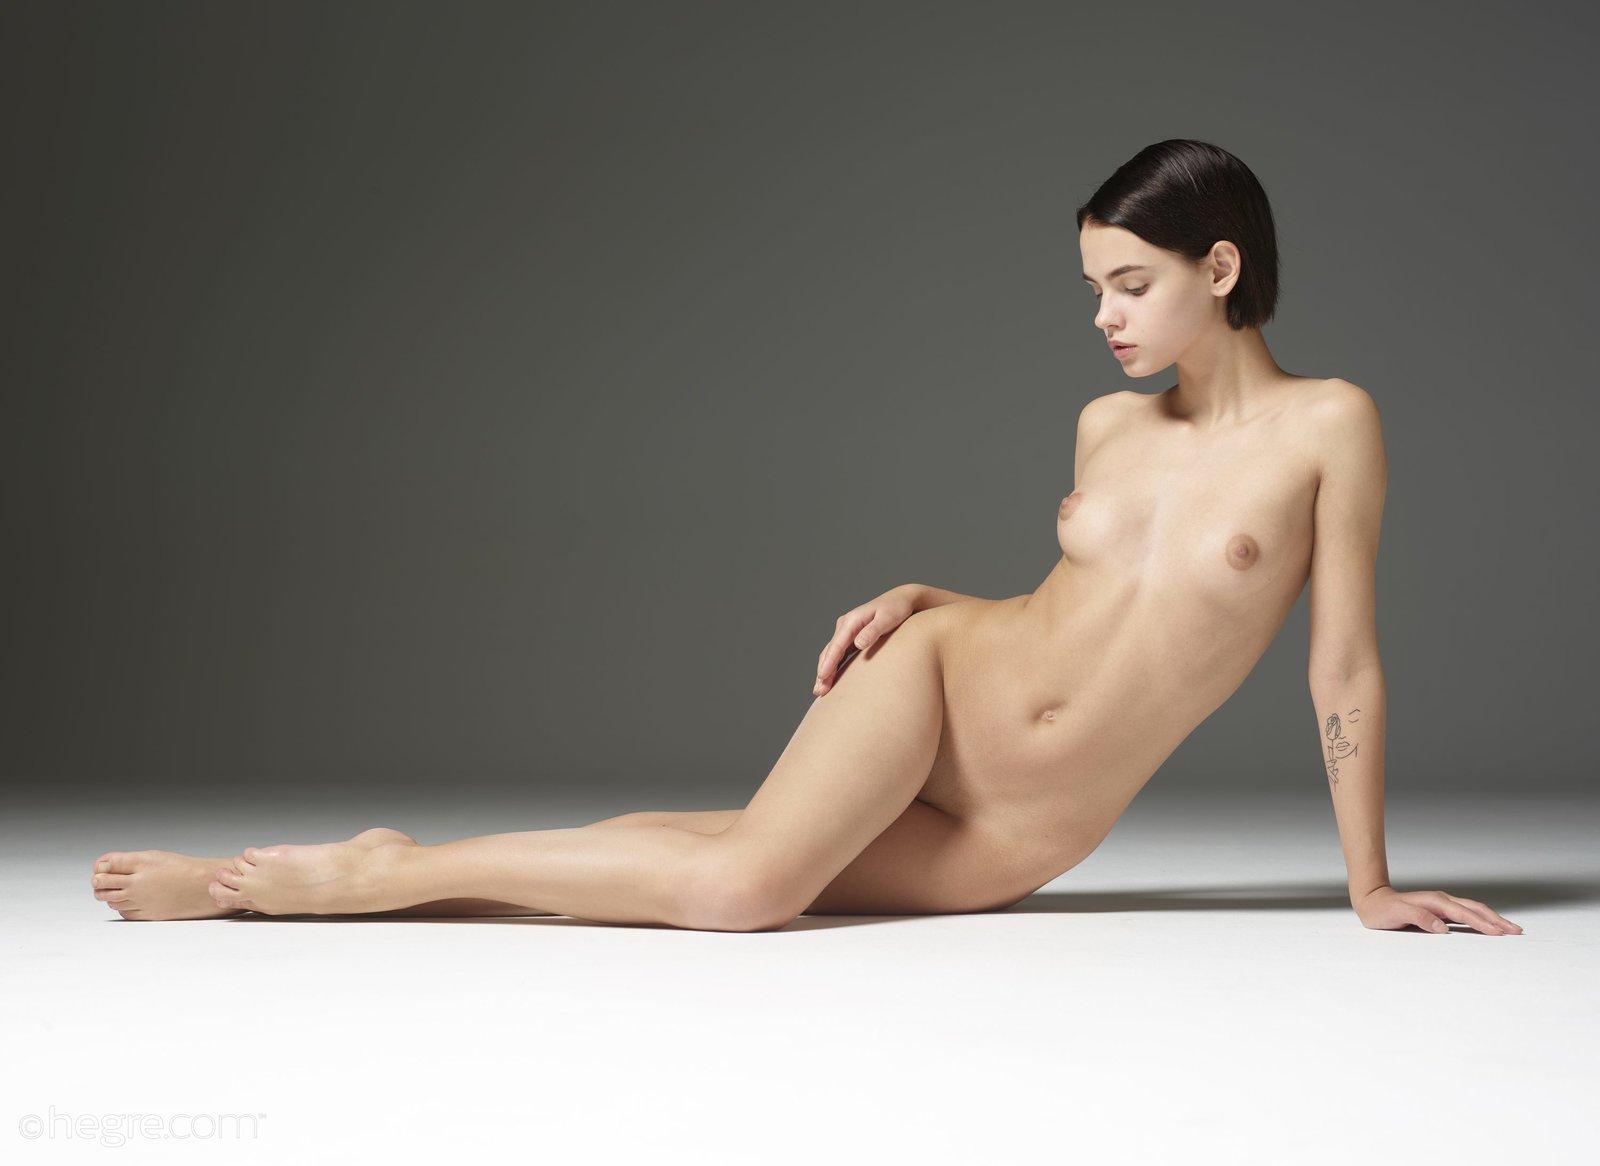 Laya leighton nude